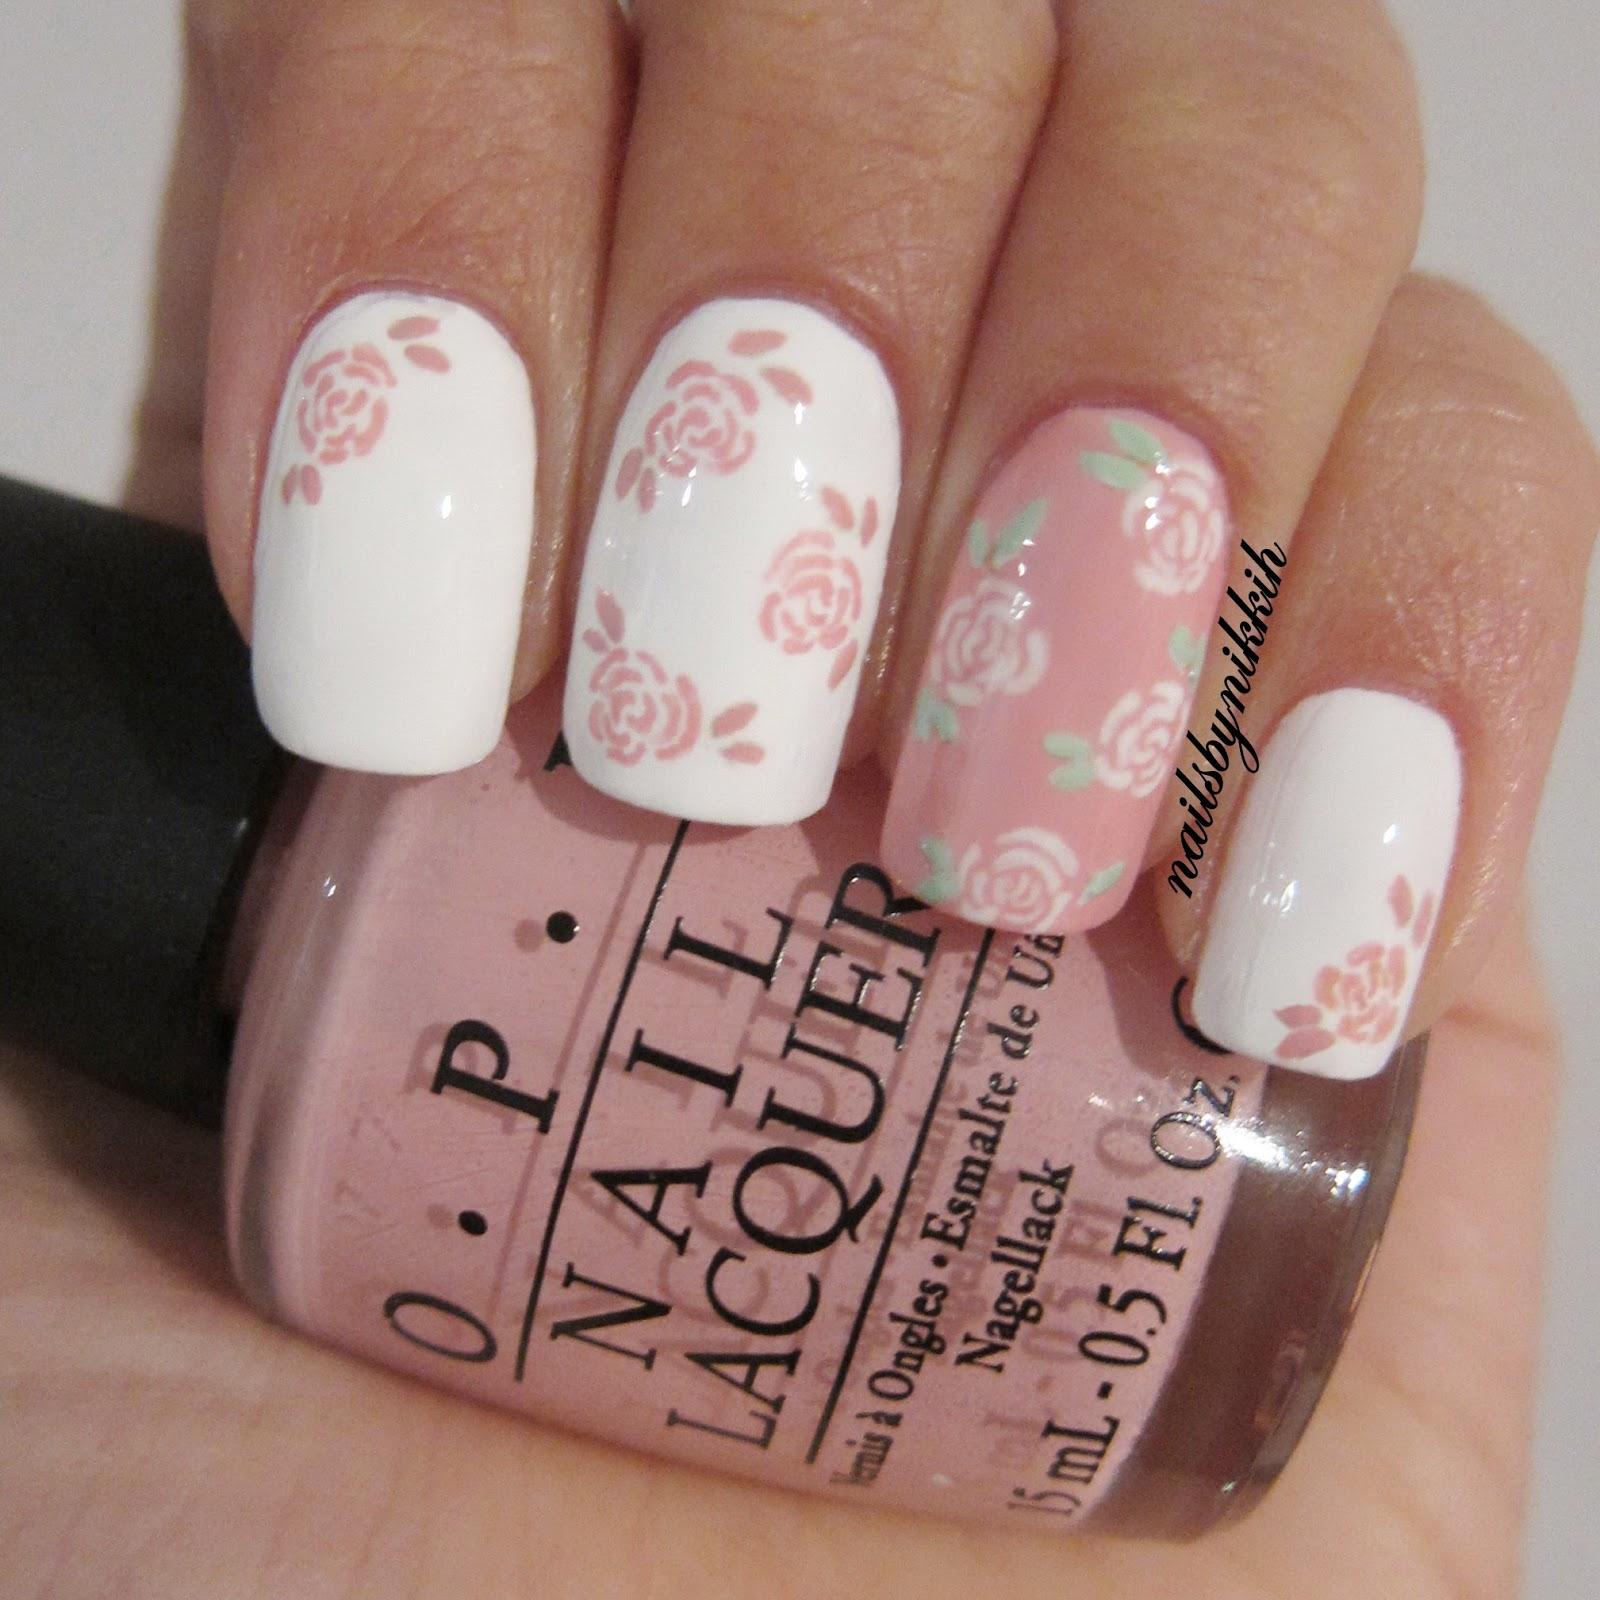 Flower Nail Art Tutorial: The Nail Art Trend: [Tutorial] The Trend: Floral Nail Art